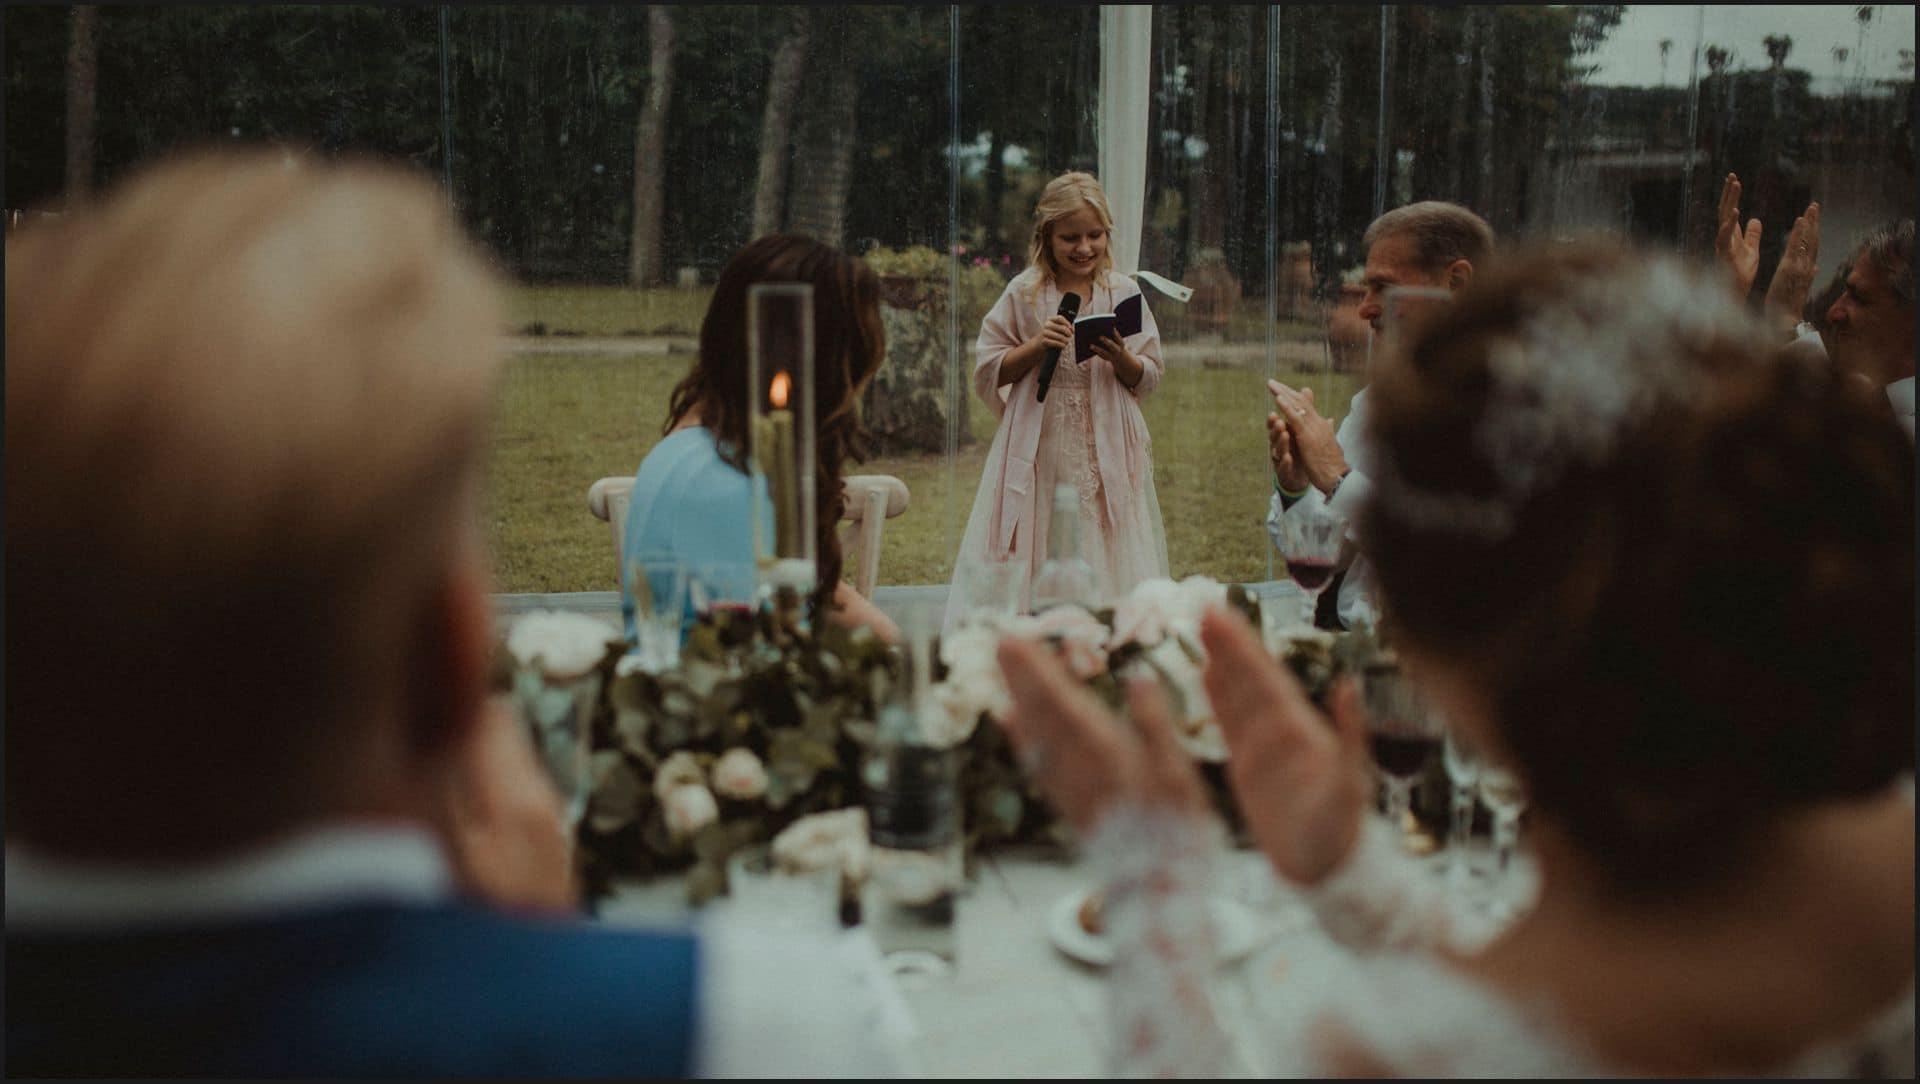 tuscany, destination wedding, chianti, bride, groom, daugther, speech